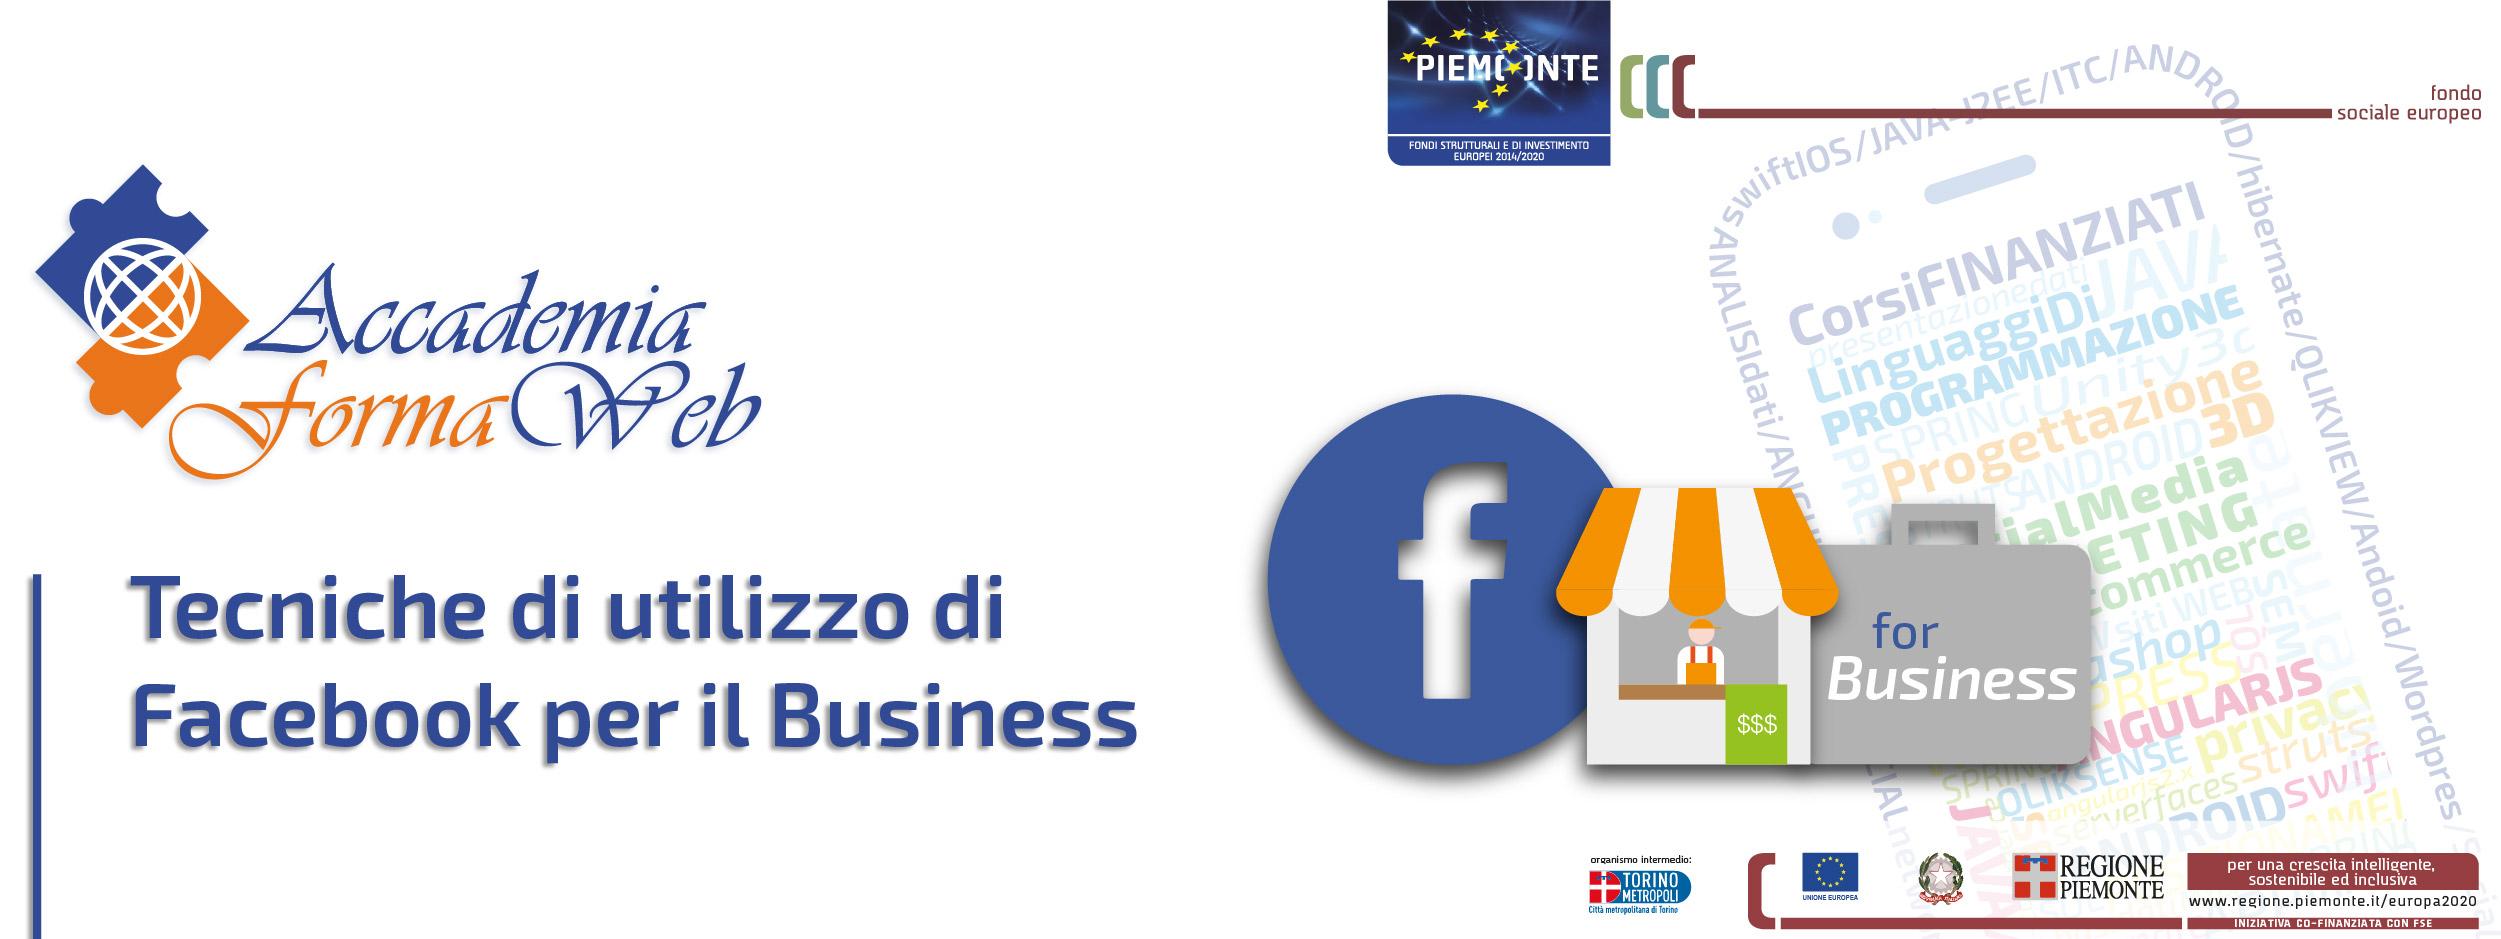 corso_finanziato_facebook-business